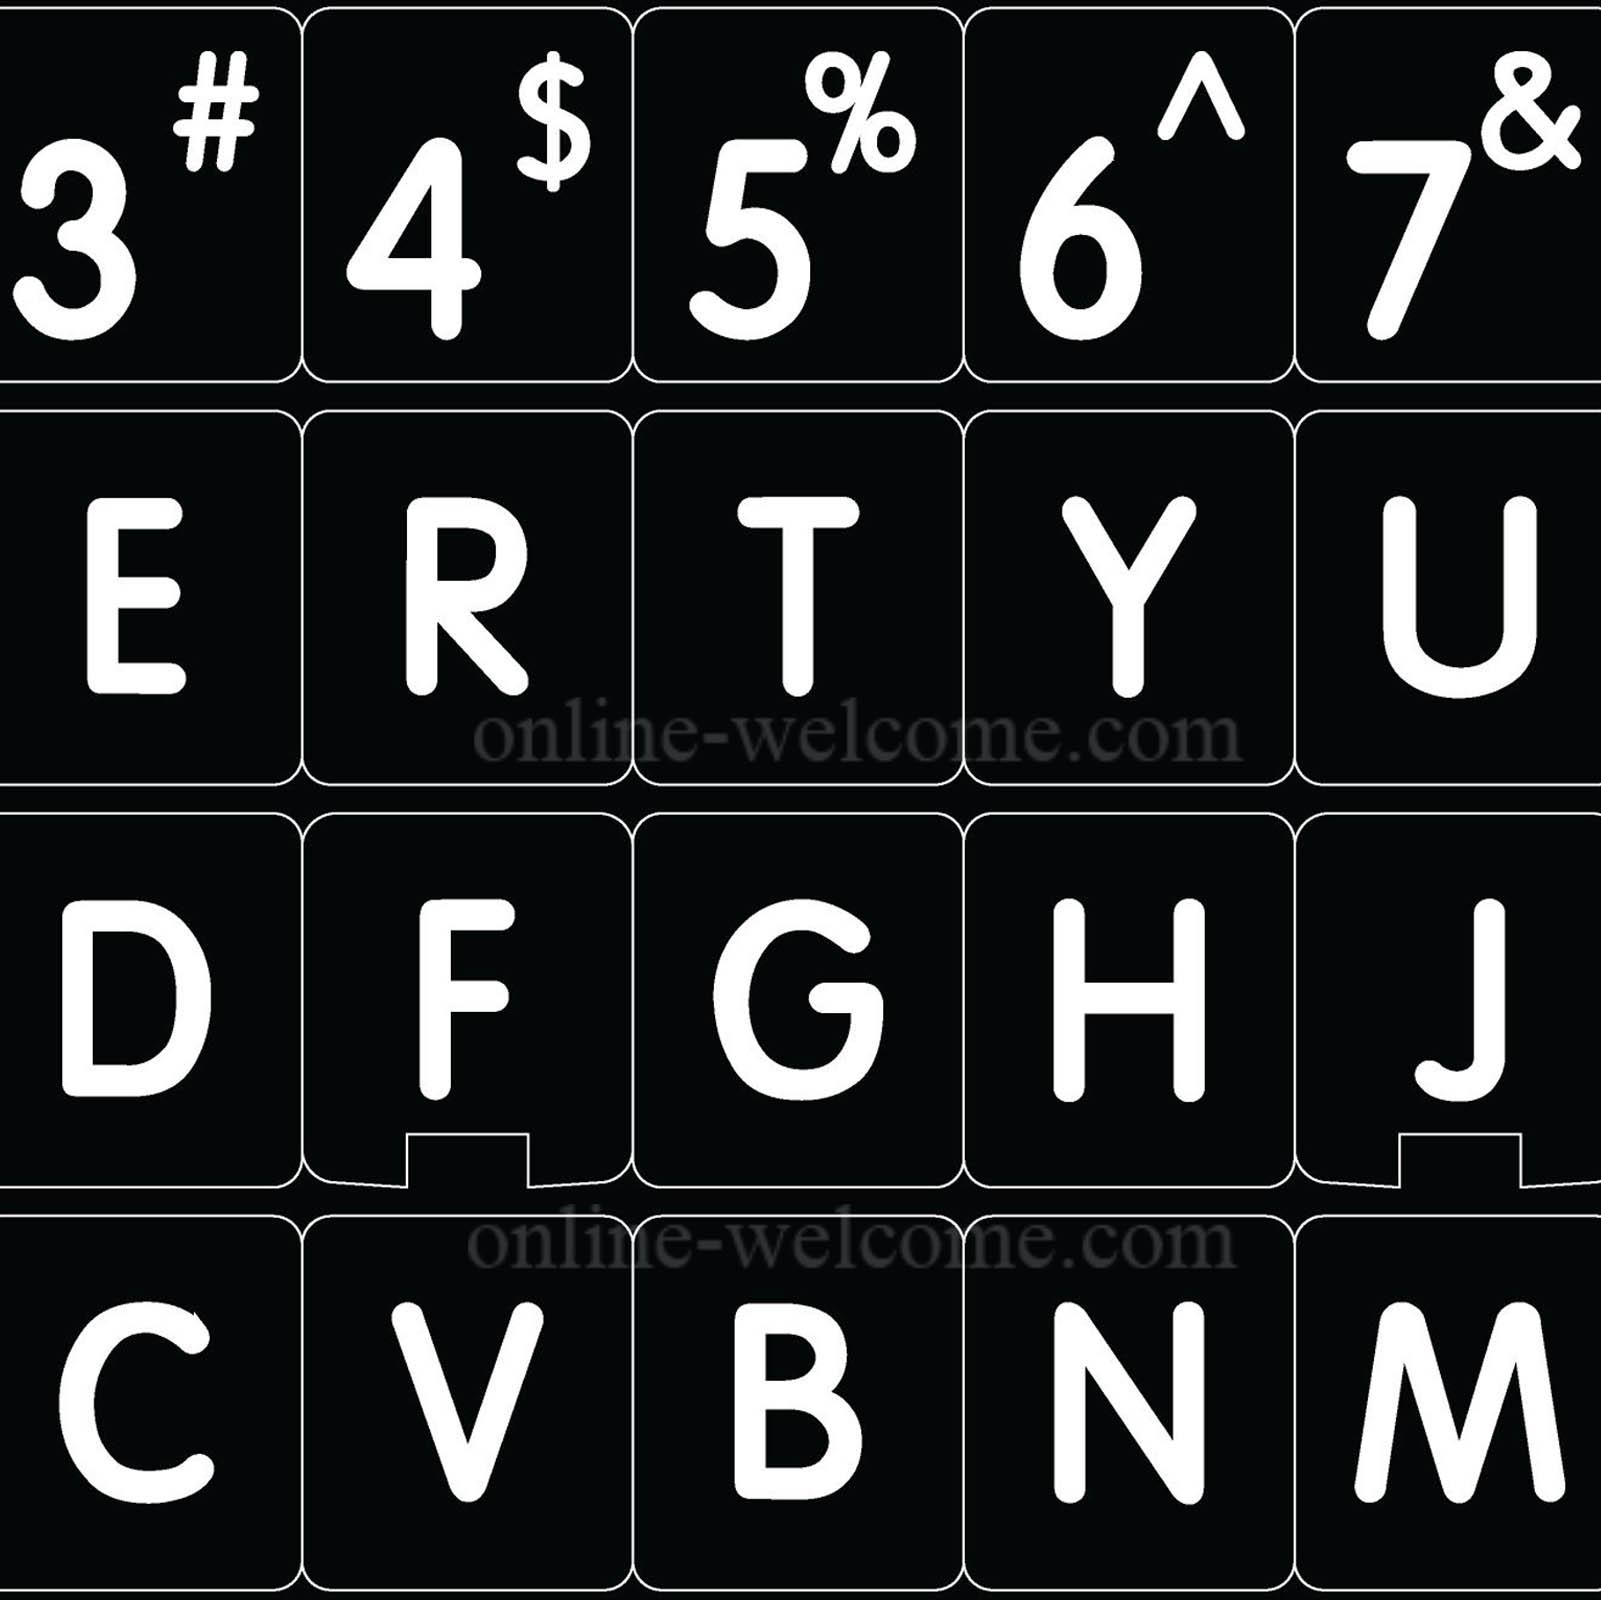 Mac English font round large letters black keyboard sticker